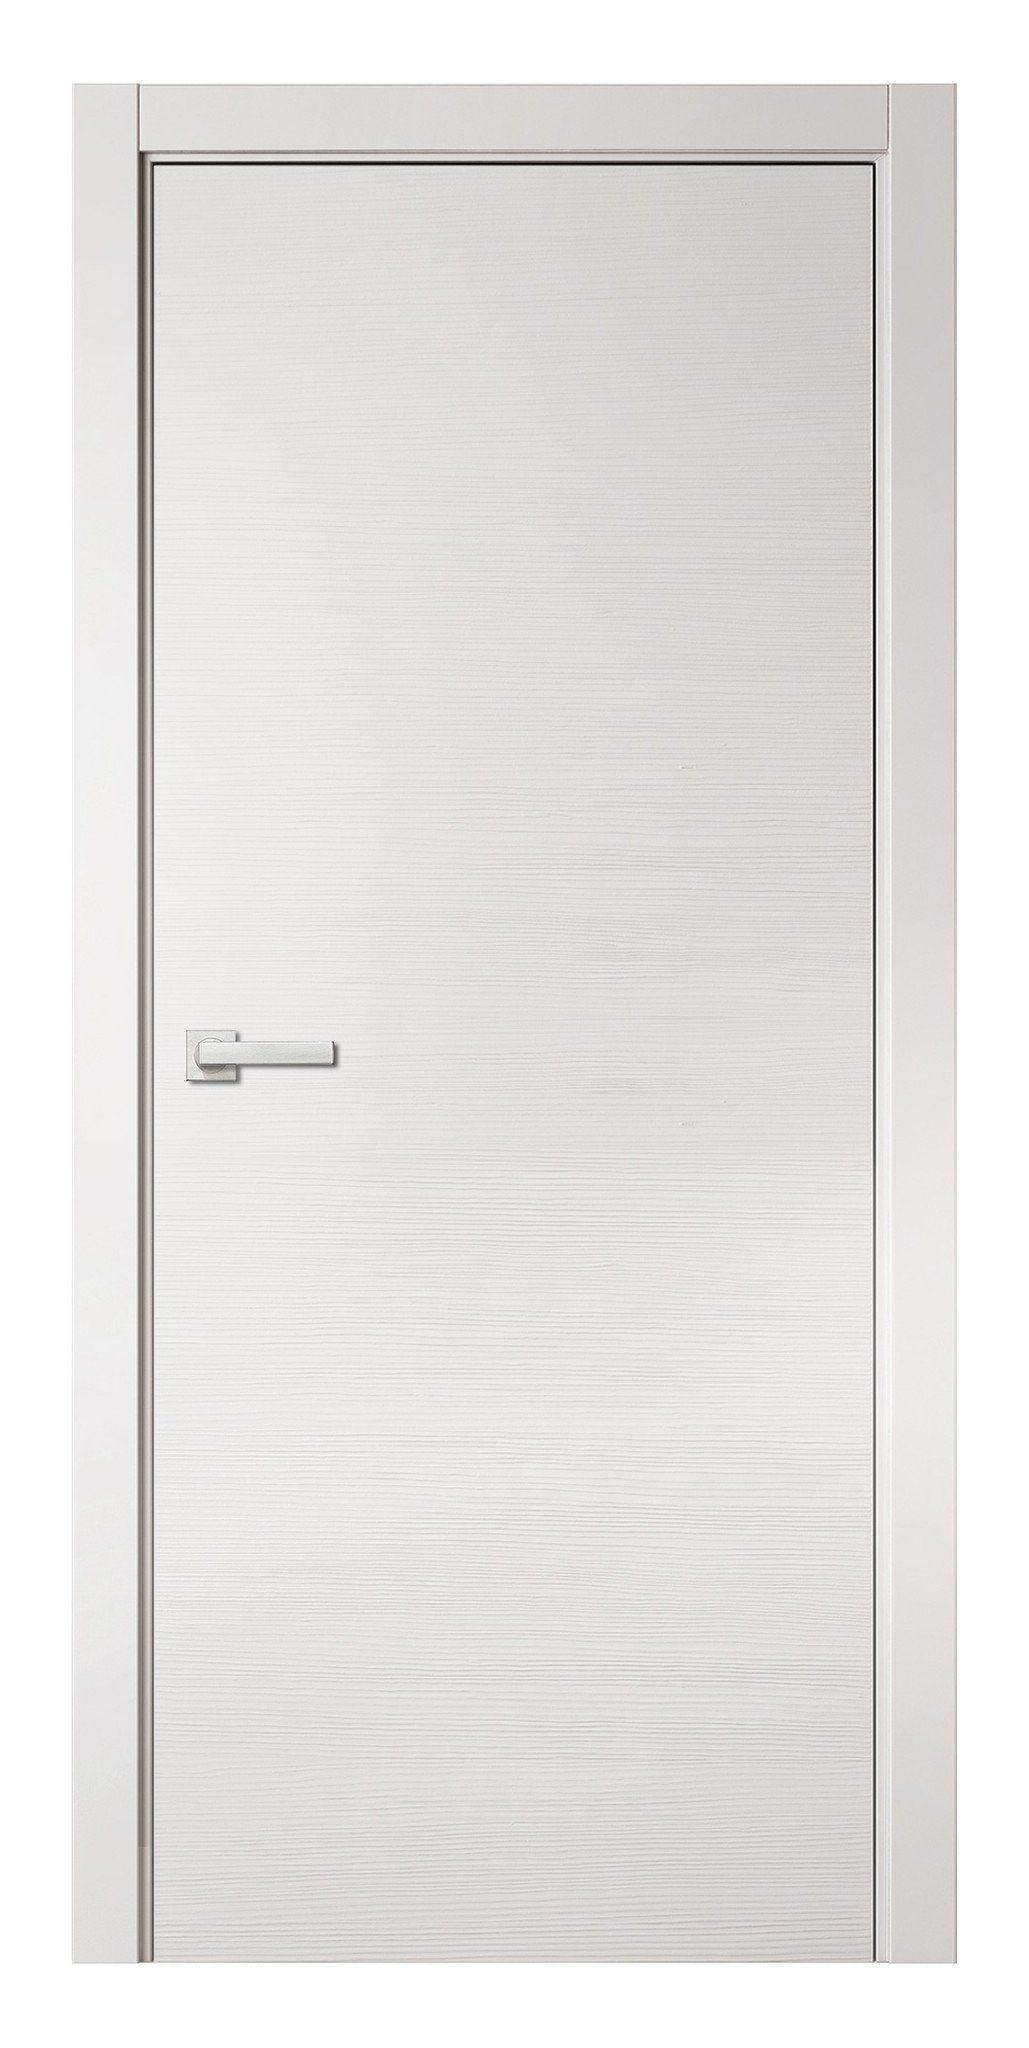 Natural Veneered Wooden Flush Door Design Mdf Living Room: Planum 0020 Interior Modern Flush Solid Pre-hung Door